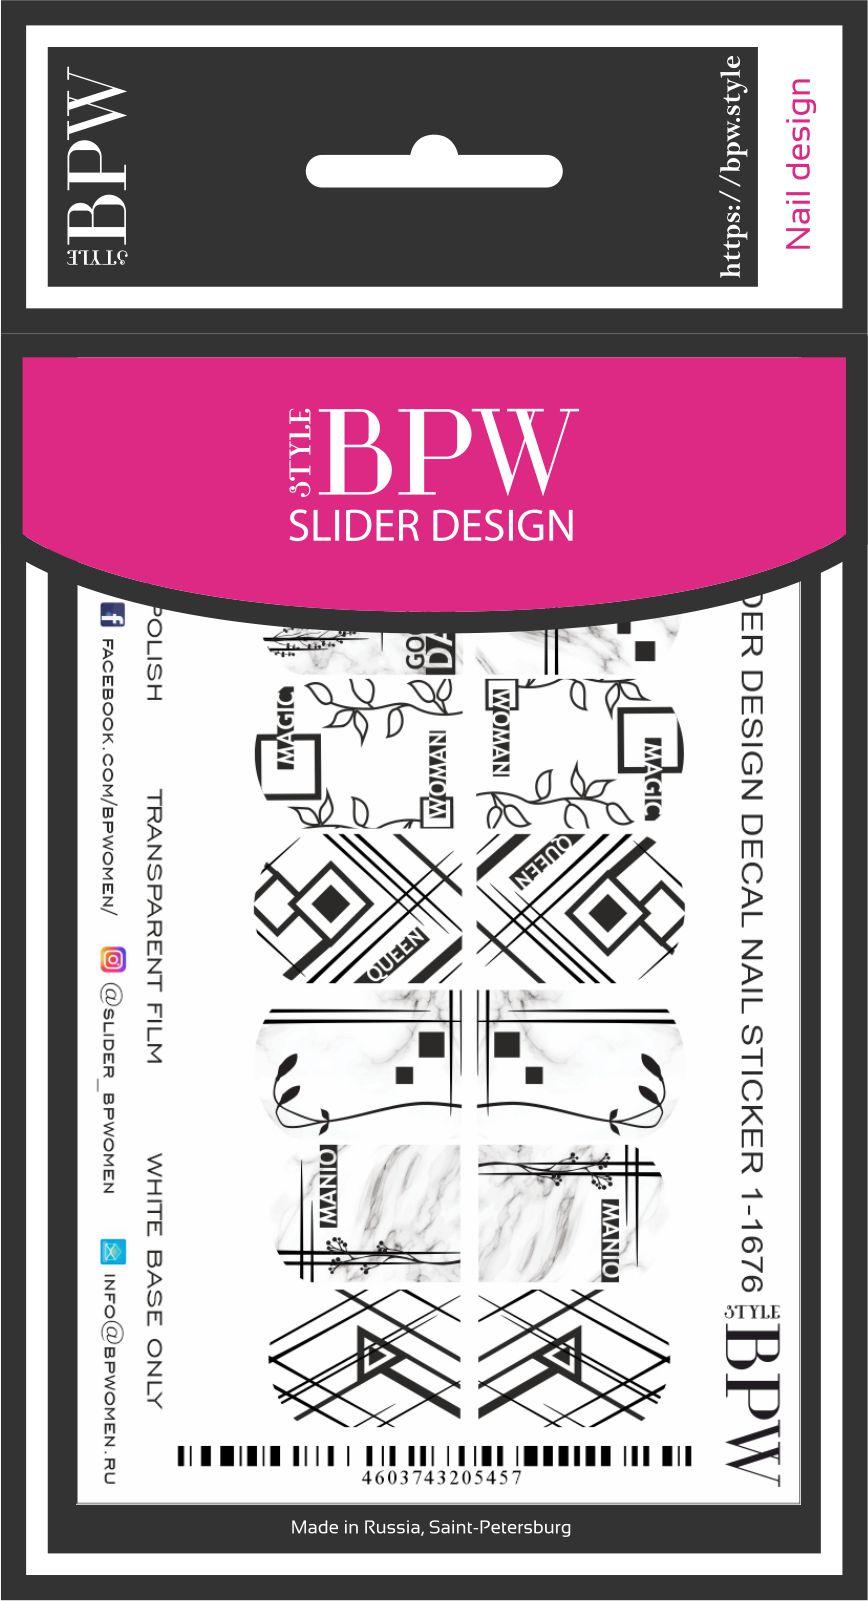 Слайдер-дизайн Magic woman, BPW.style, sd1-1676